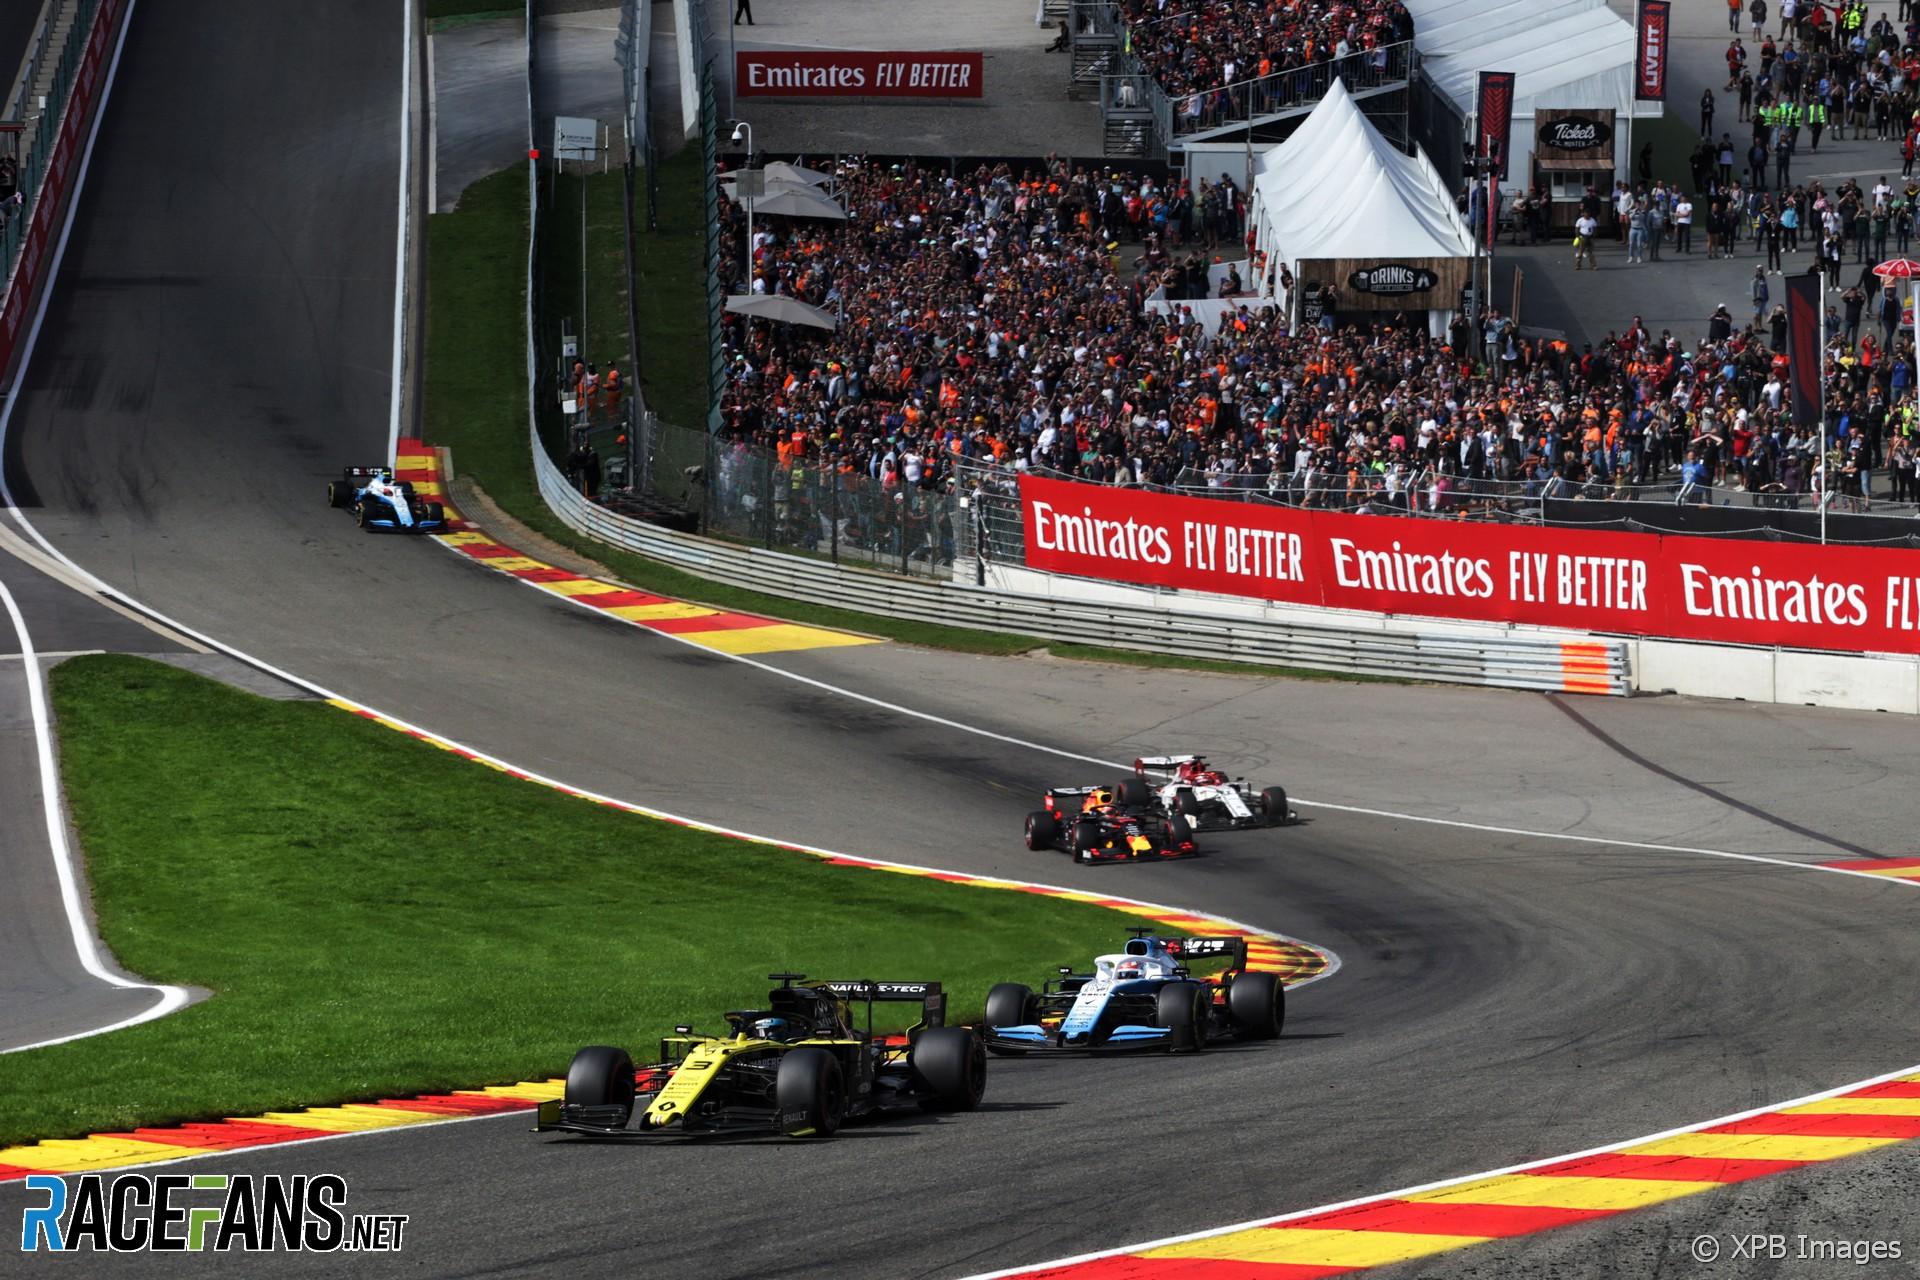 Daniel Ricciardo, Renault, Spa-Francorchamps, 2019